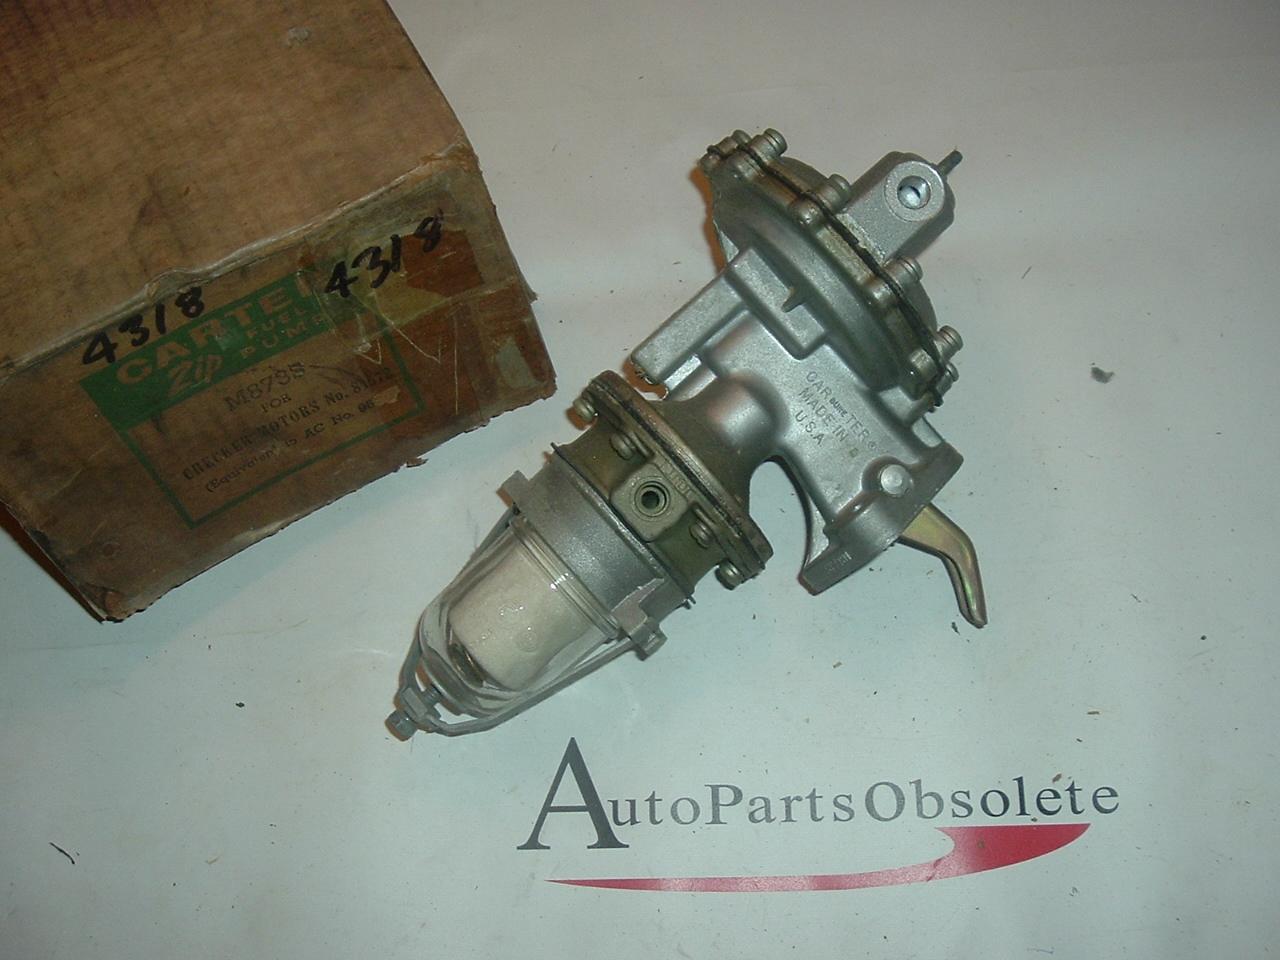 1954-63 Checker Willys jeep Kaiser Frazer fuel pump (a m873s)